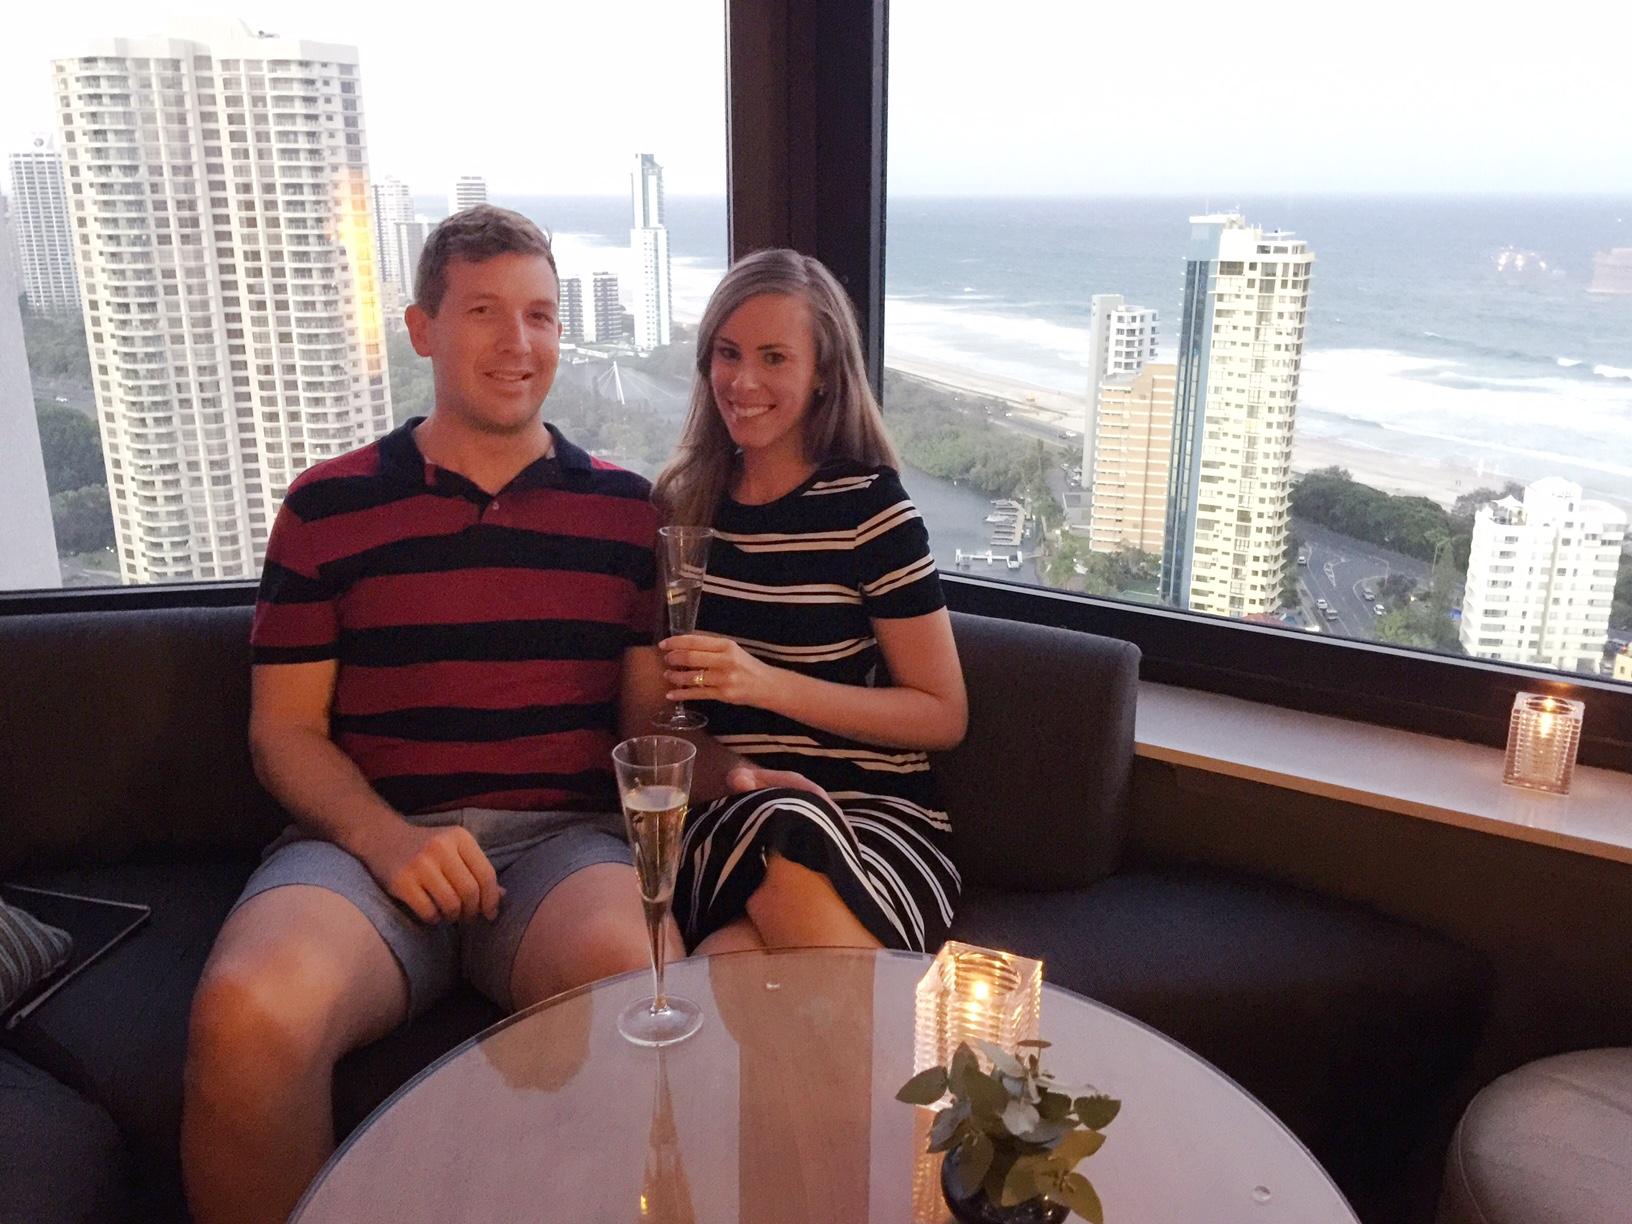 surfers paradise marriott resort and spa gold coast australia beach honeymoon romantic couples holiday luxury vacation hotel review